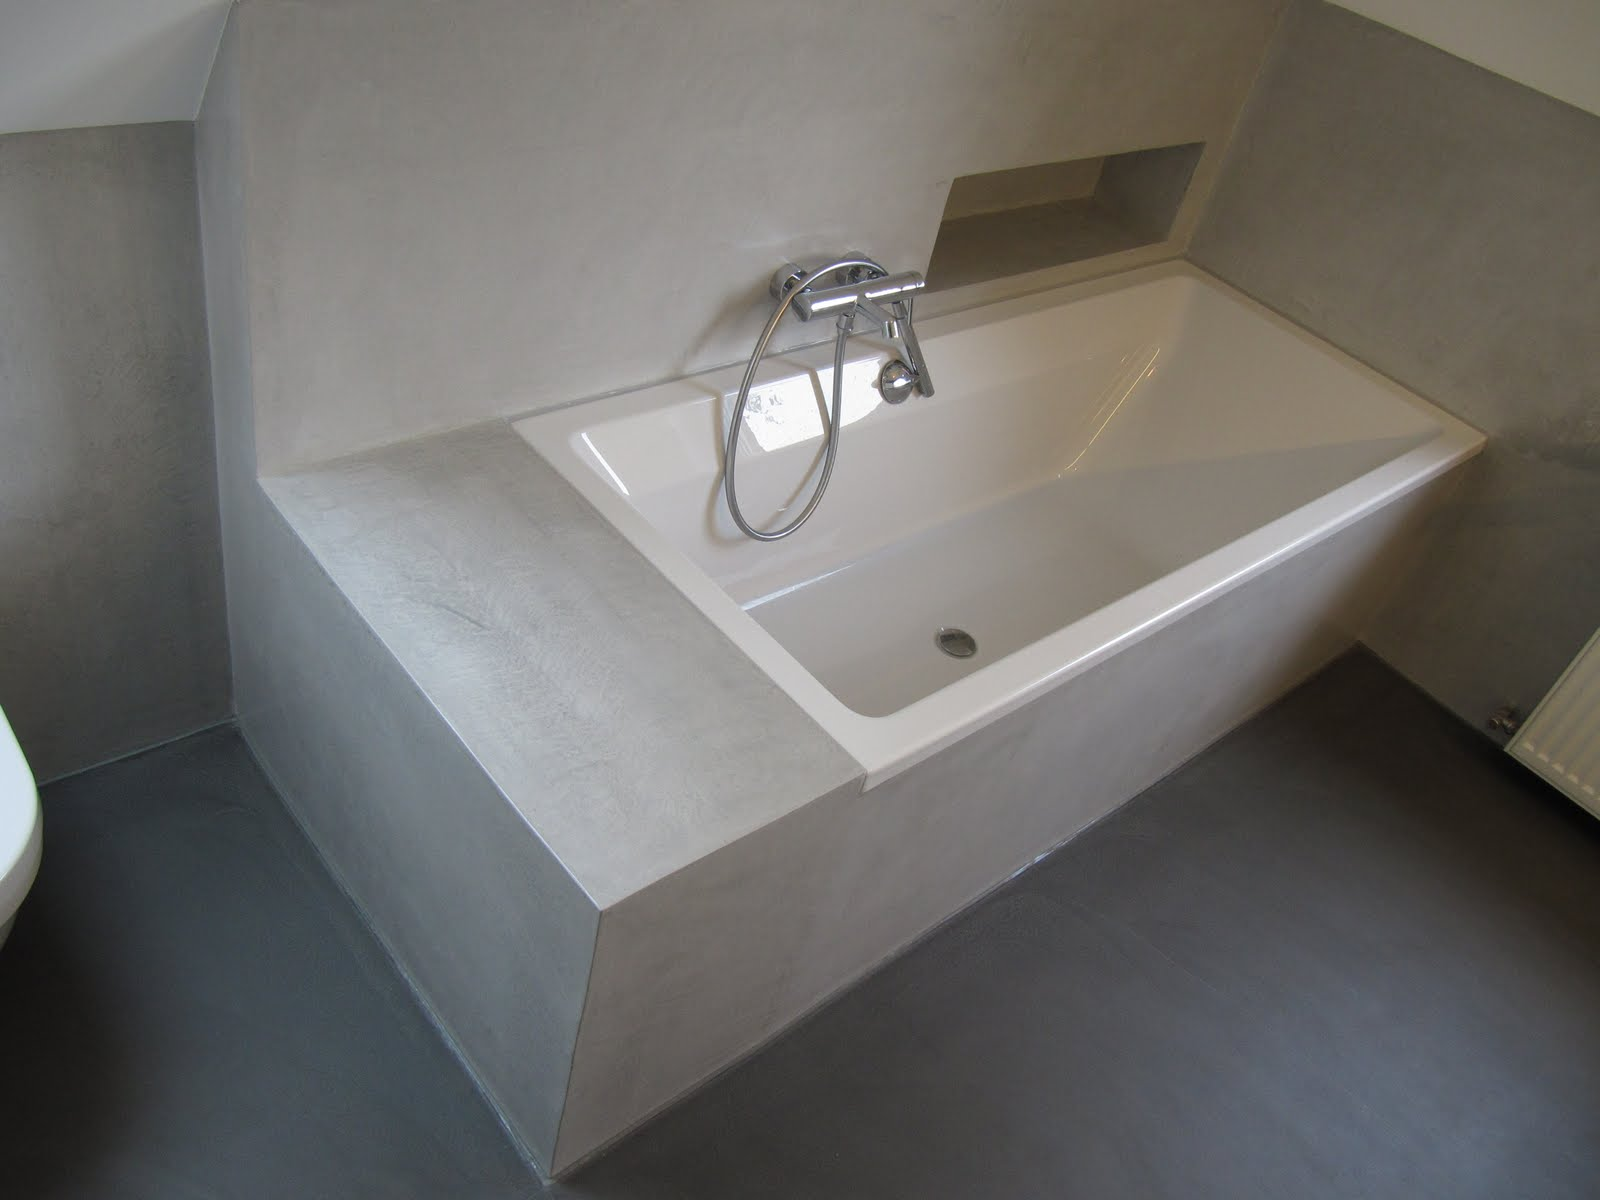 design handwerk beton cire bad. Black Bedroom Furniture Sets. Home Design Ideas